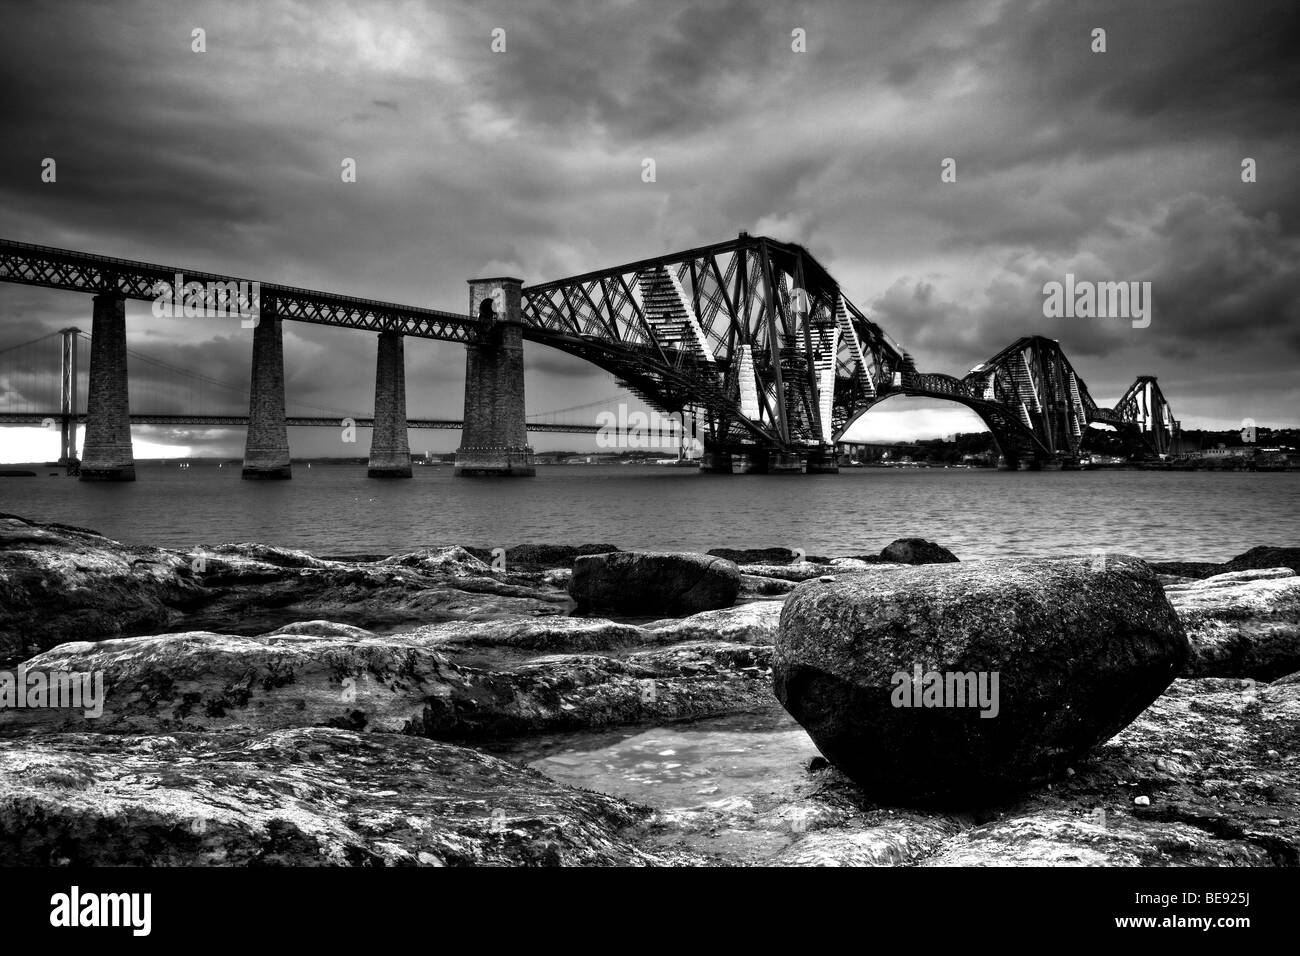 The Forth Railway Bridge in Edinburgh, Scotland, United Kingdom, Europe - Stock Image